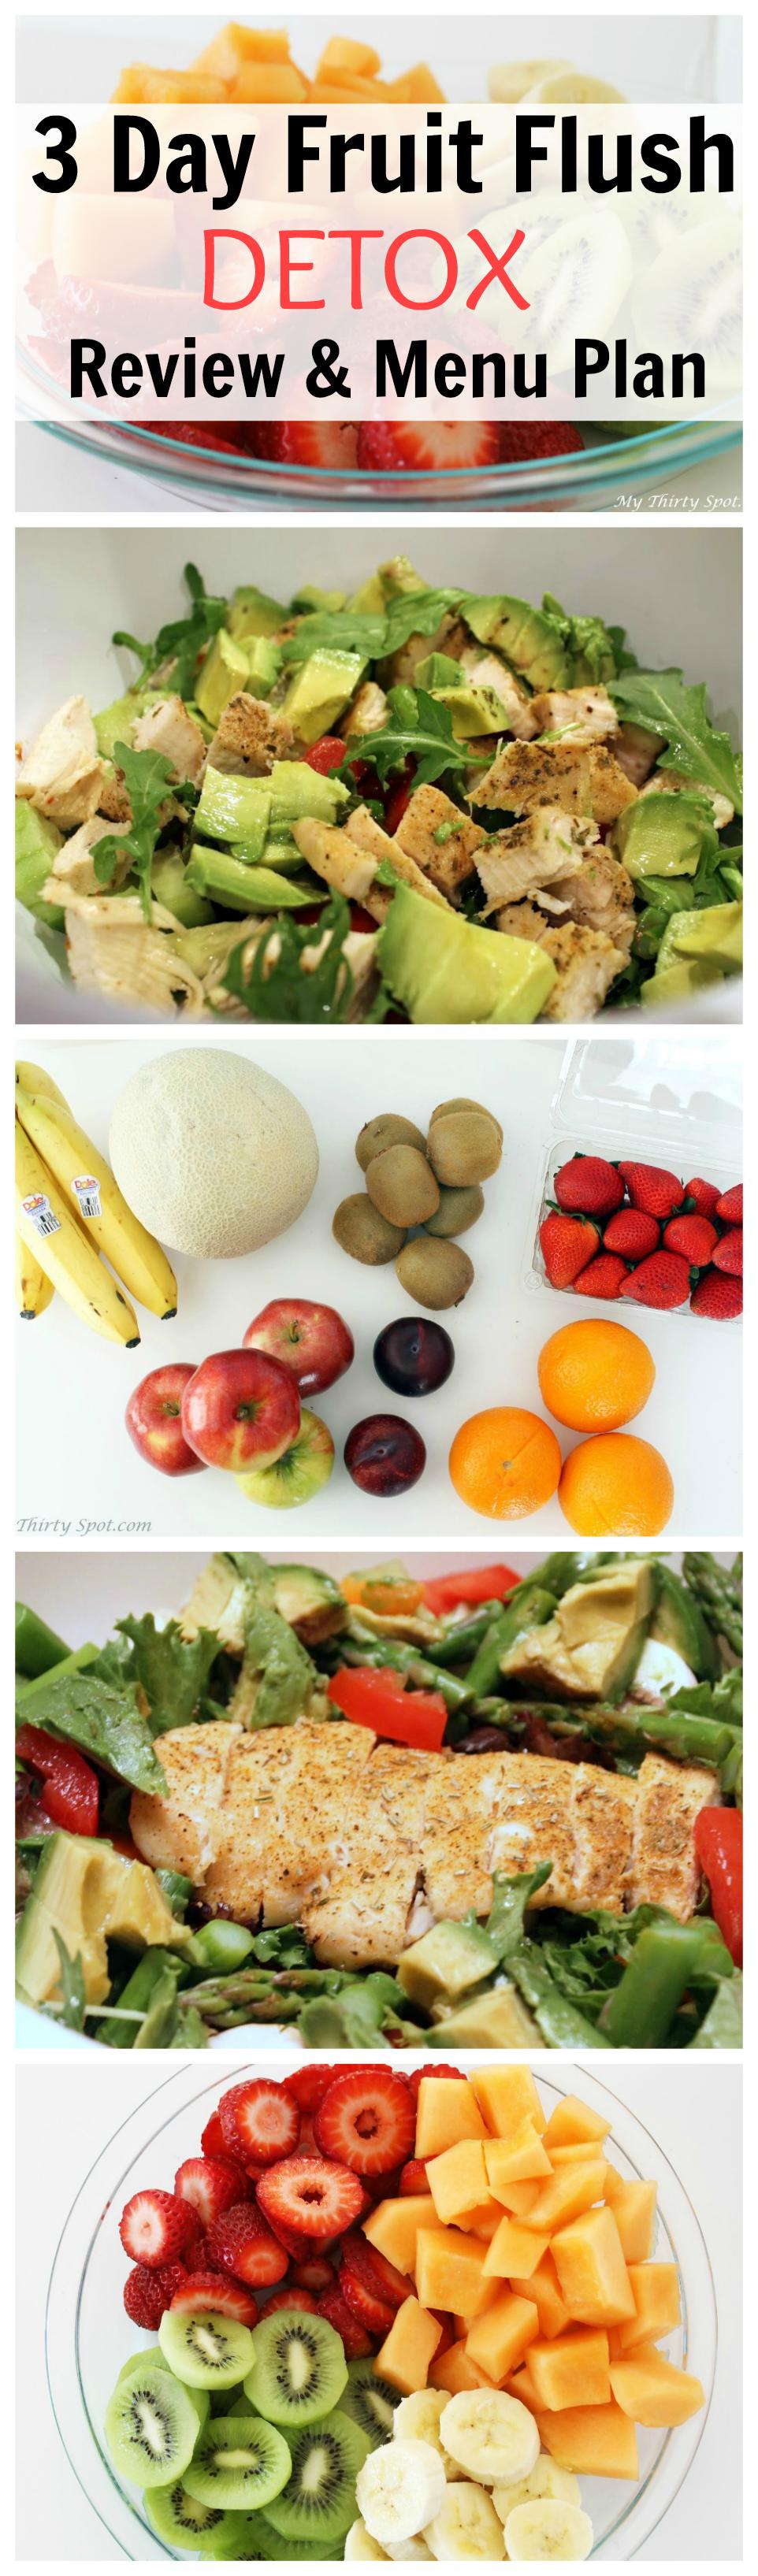 Best diet super quick weight loss